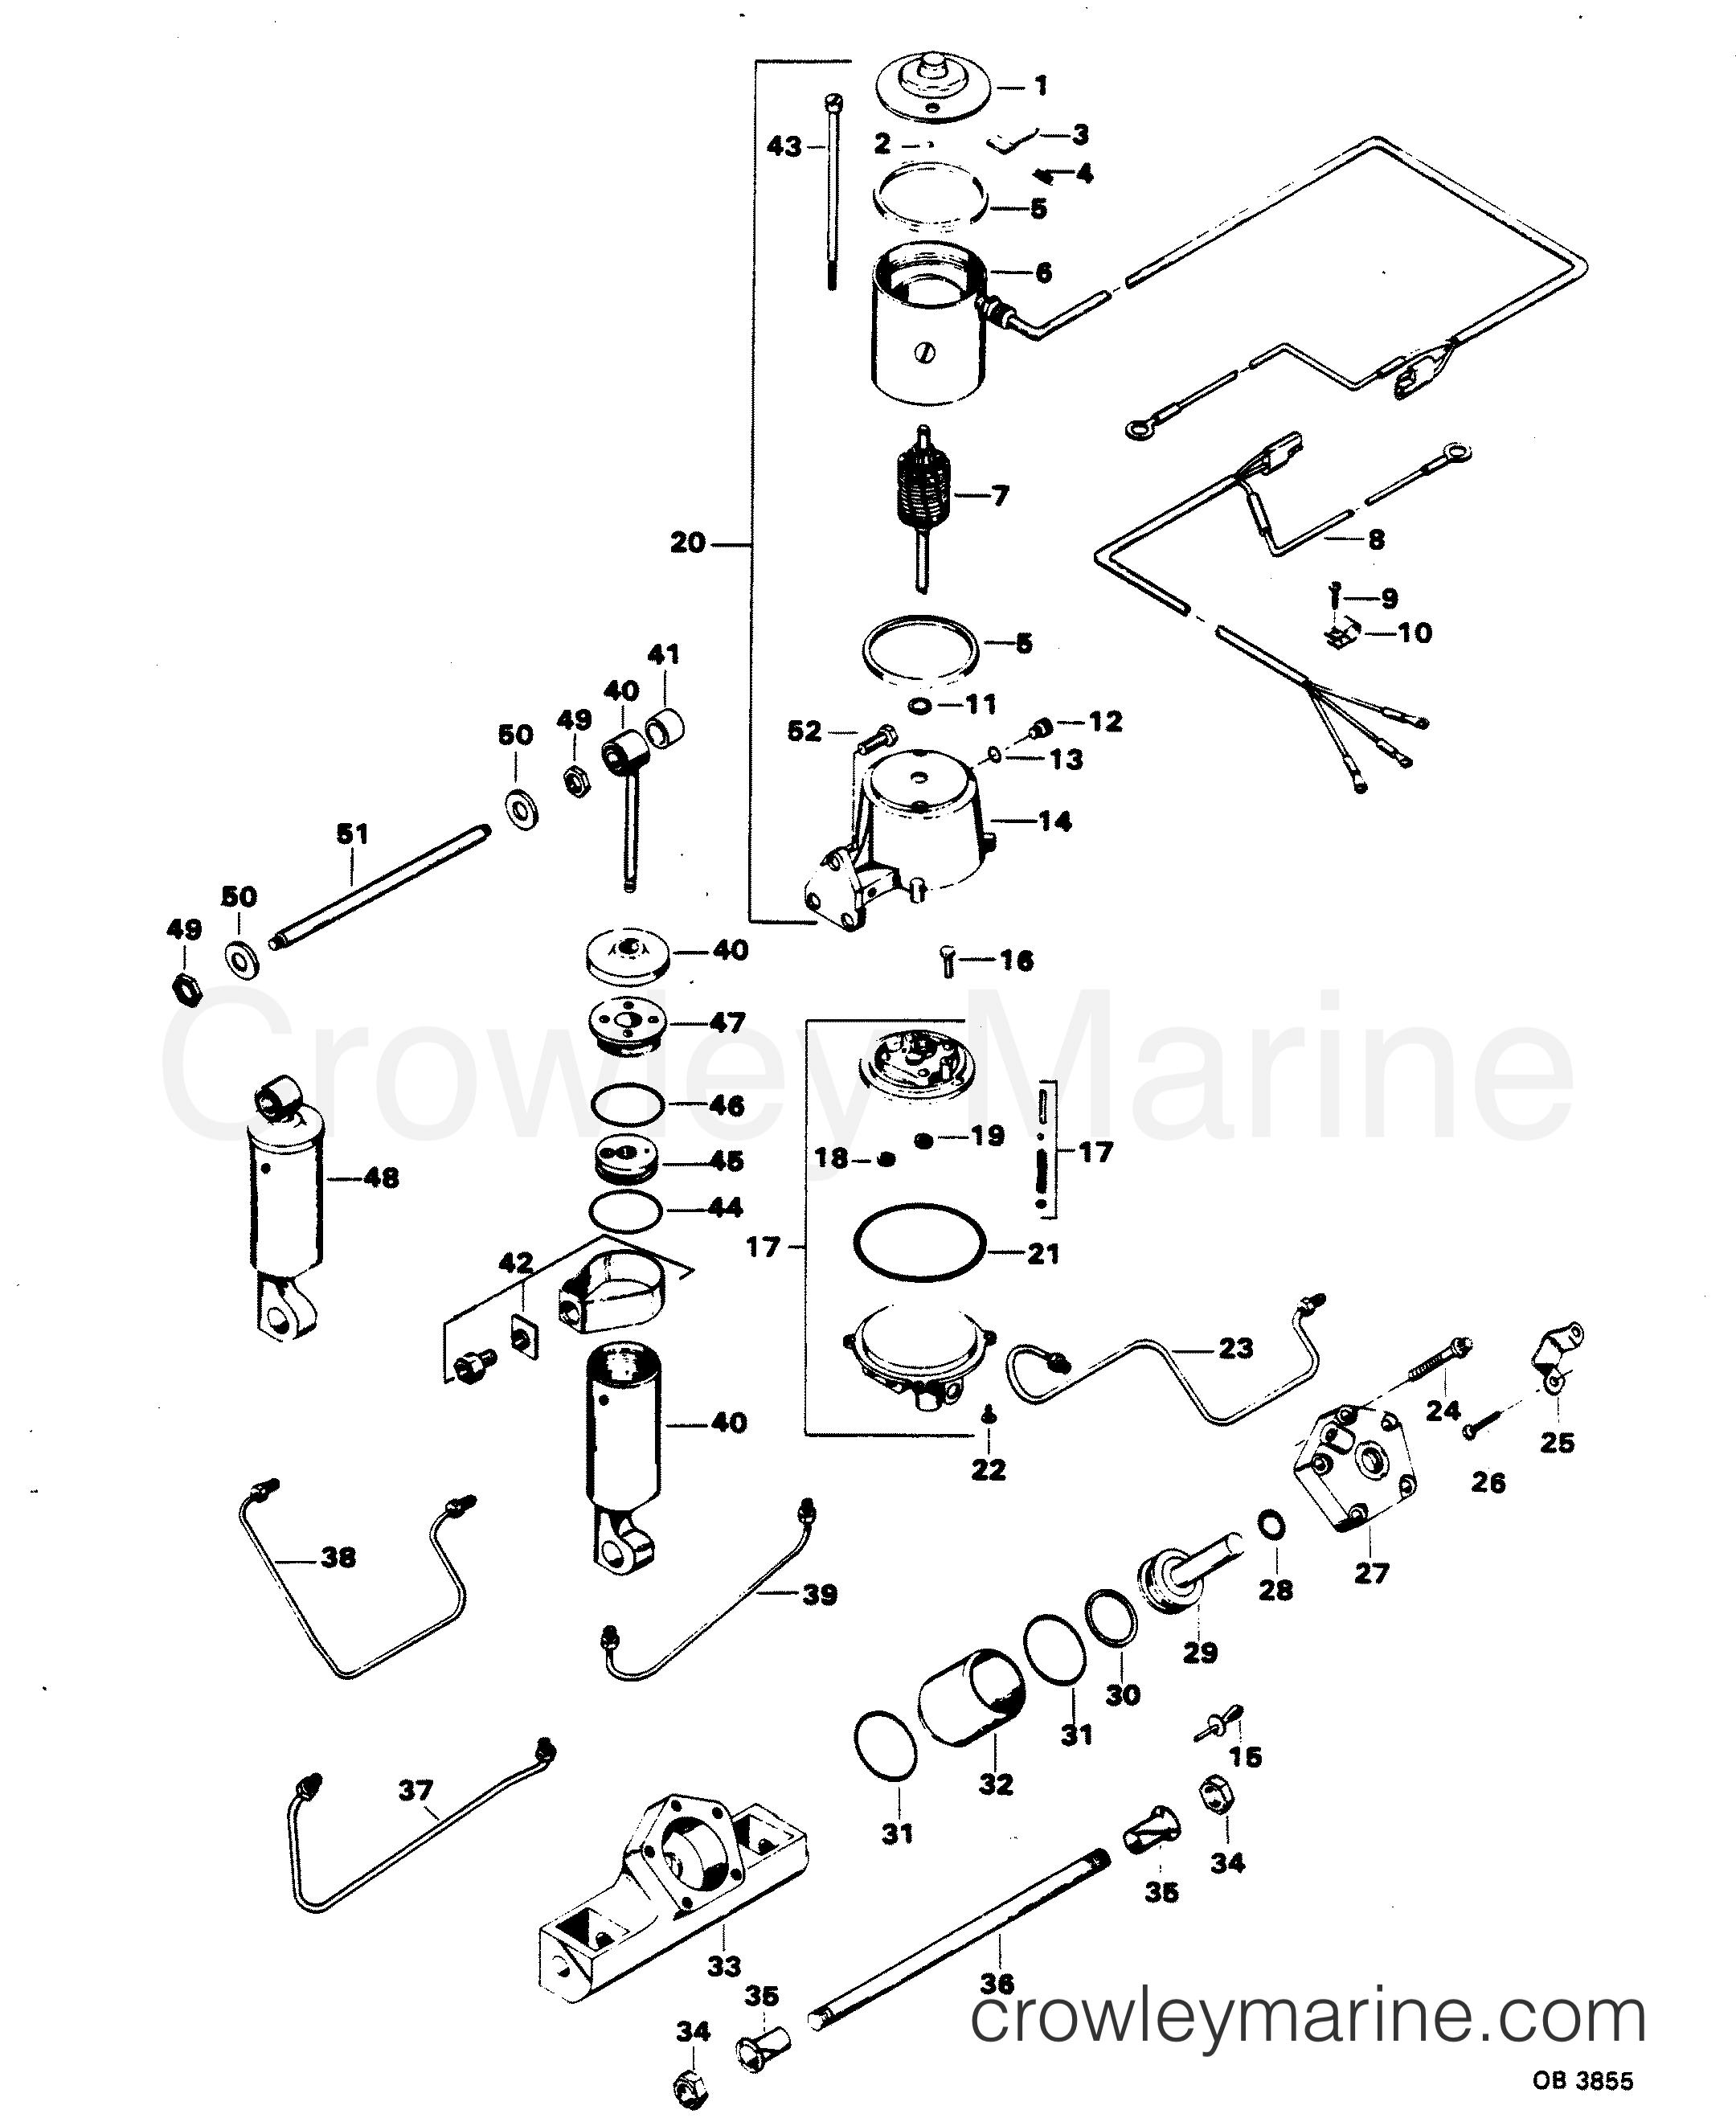 1983 Mercury Chrysler Outboard 1158b3f Carburetor Diagram And Parts